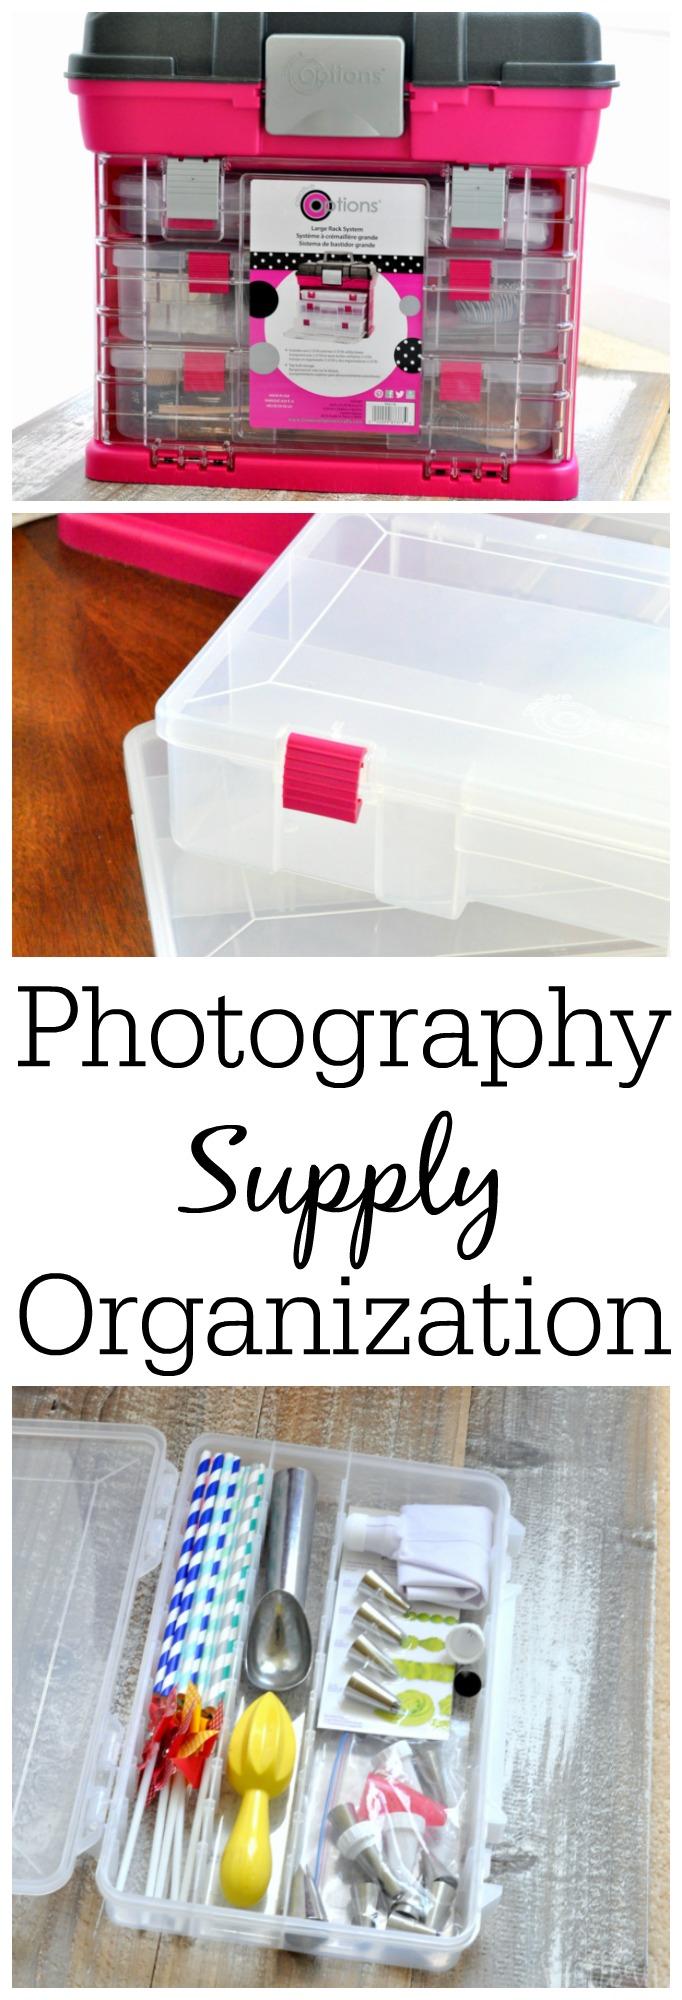 photography-supply-organization